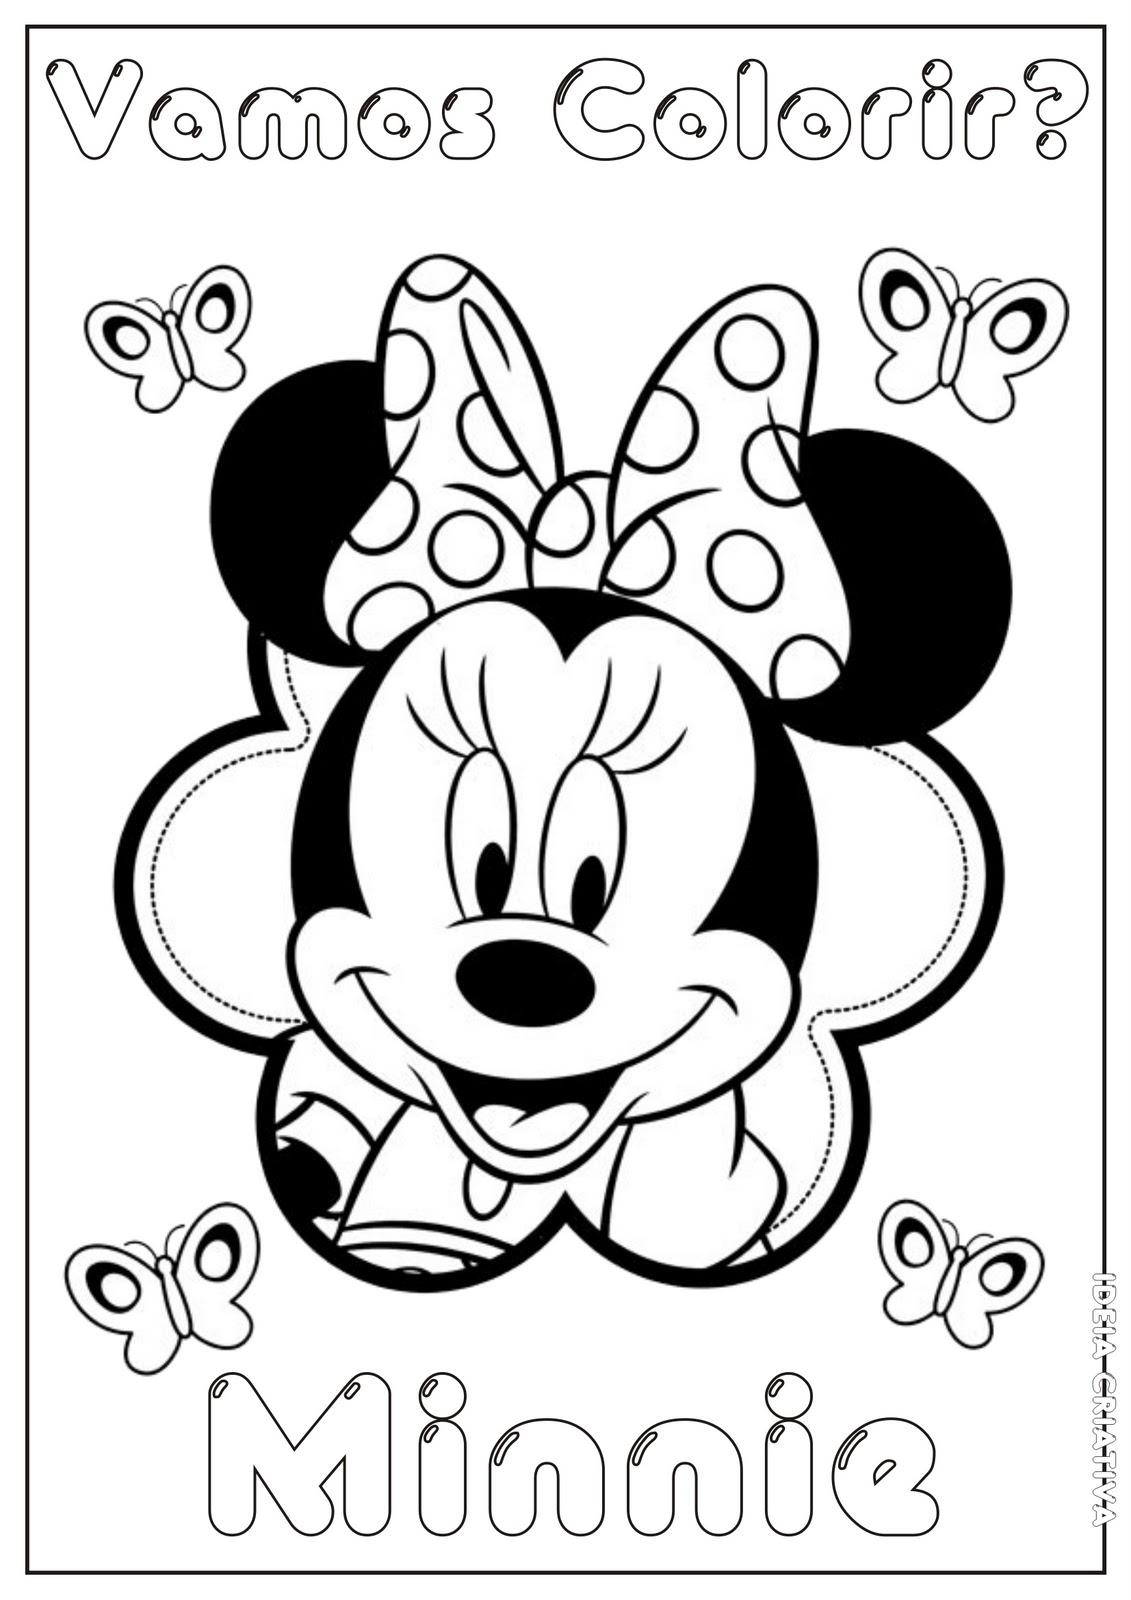 Dibujos De Minnie Para Colorear E Imprimir Imagesacolorier